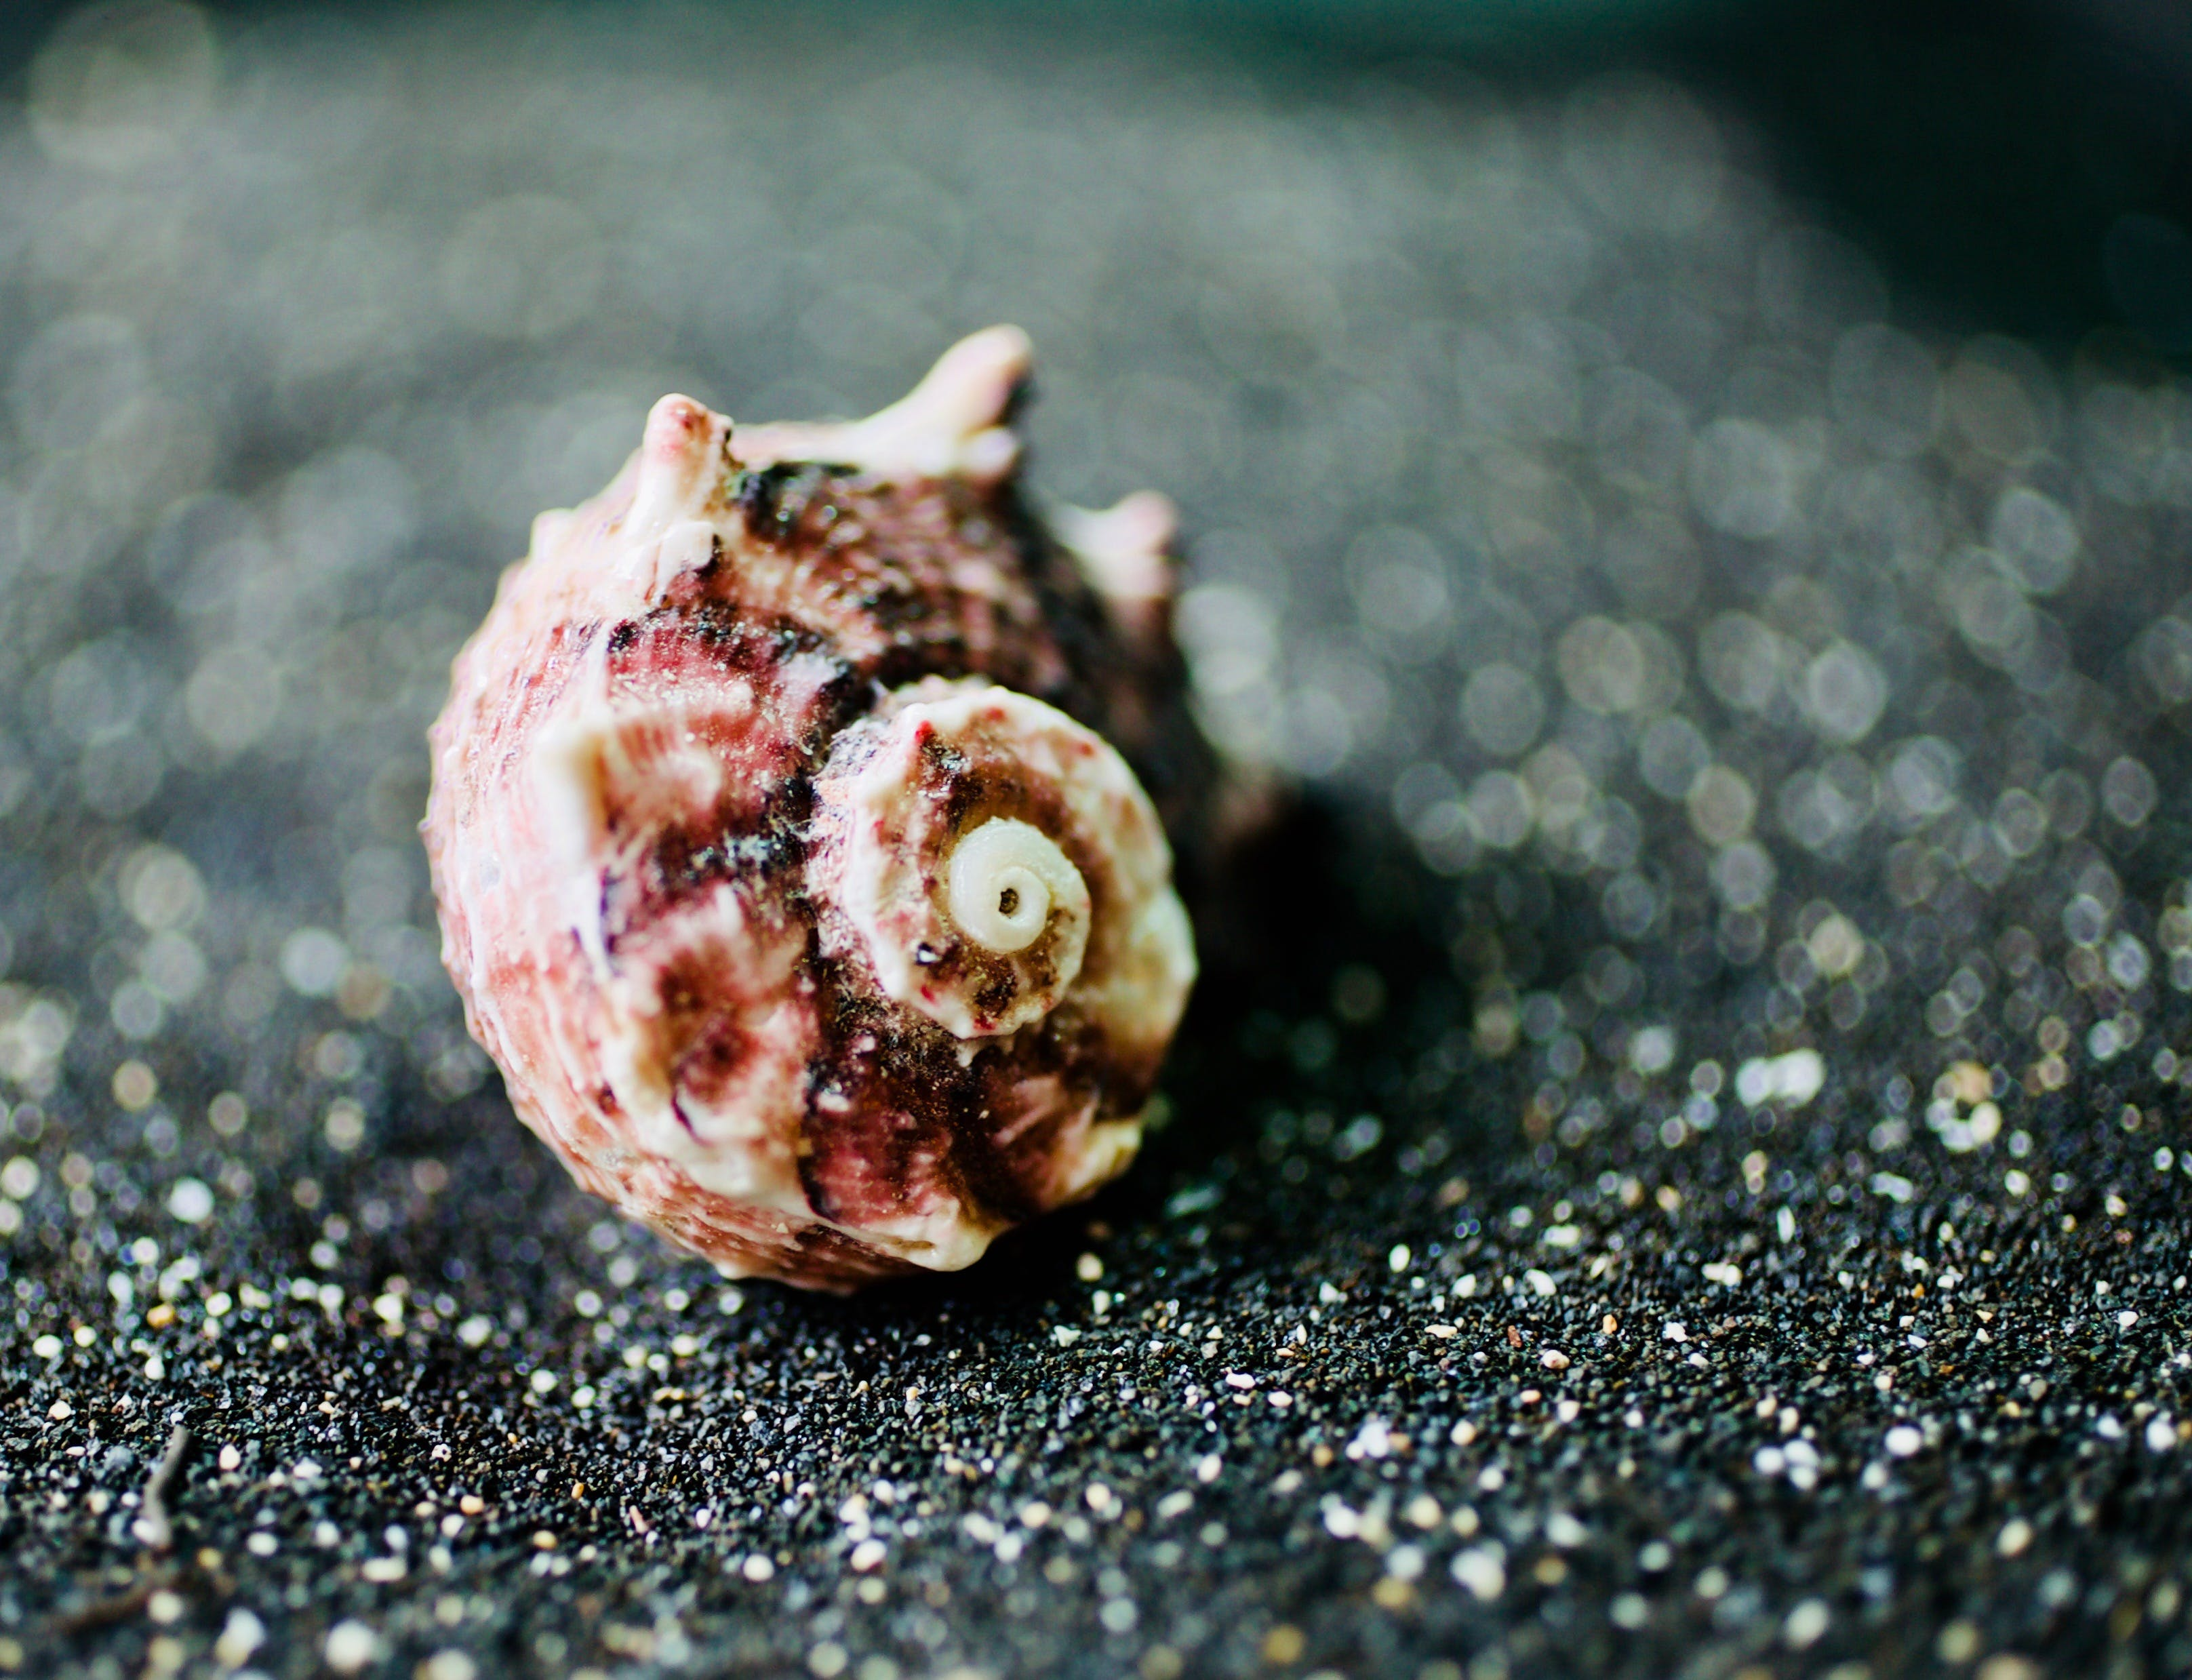 Close-up Photo of Seashell